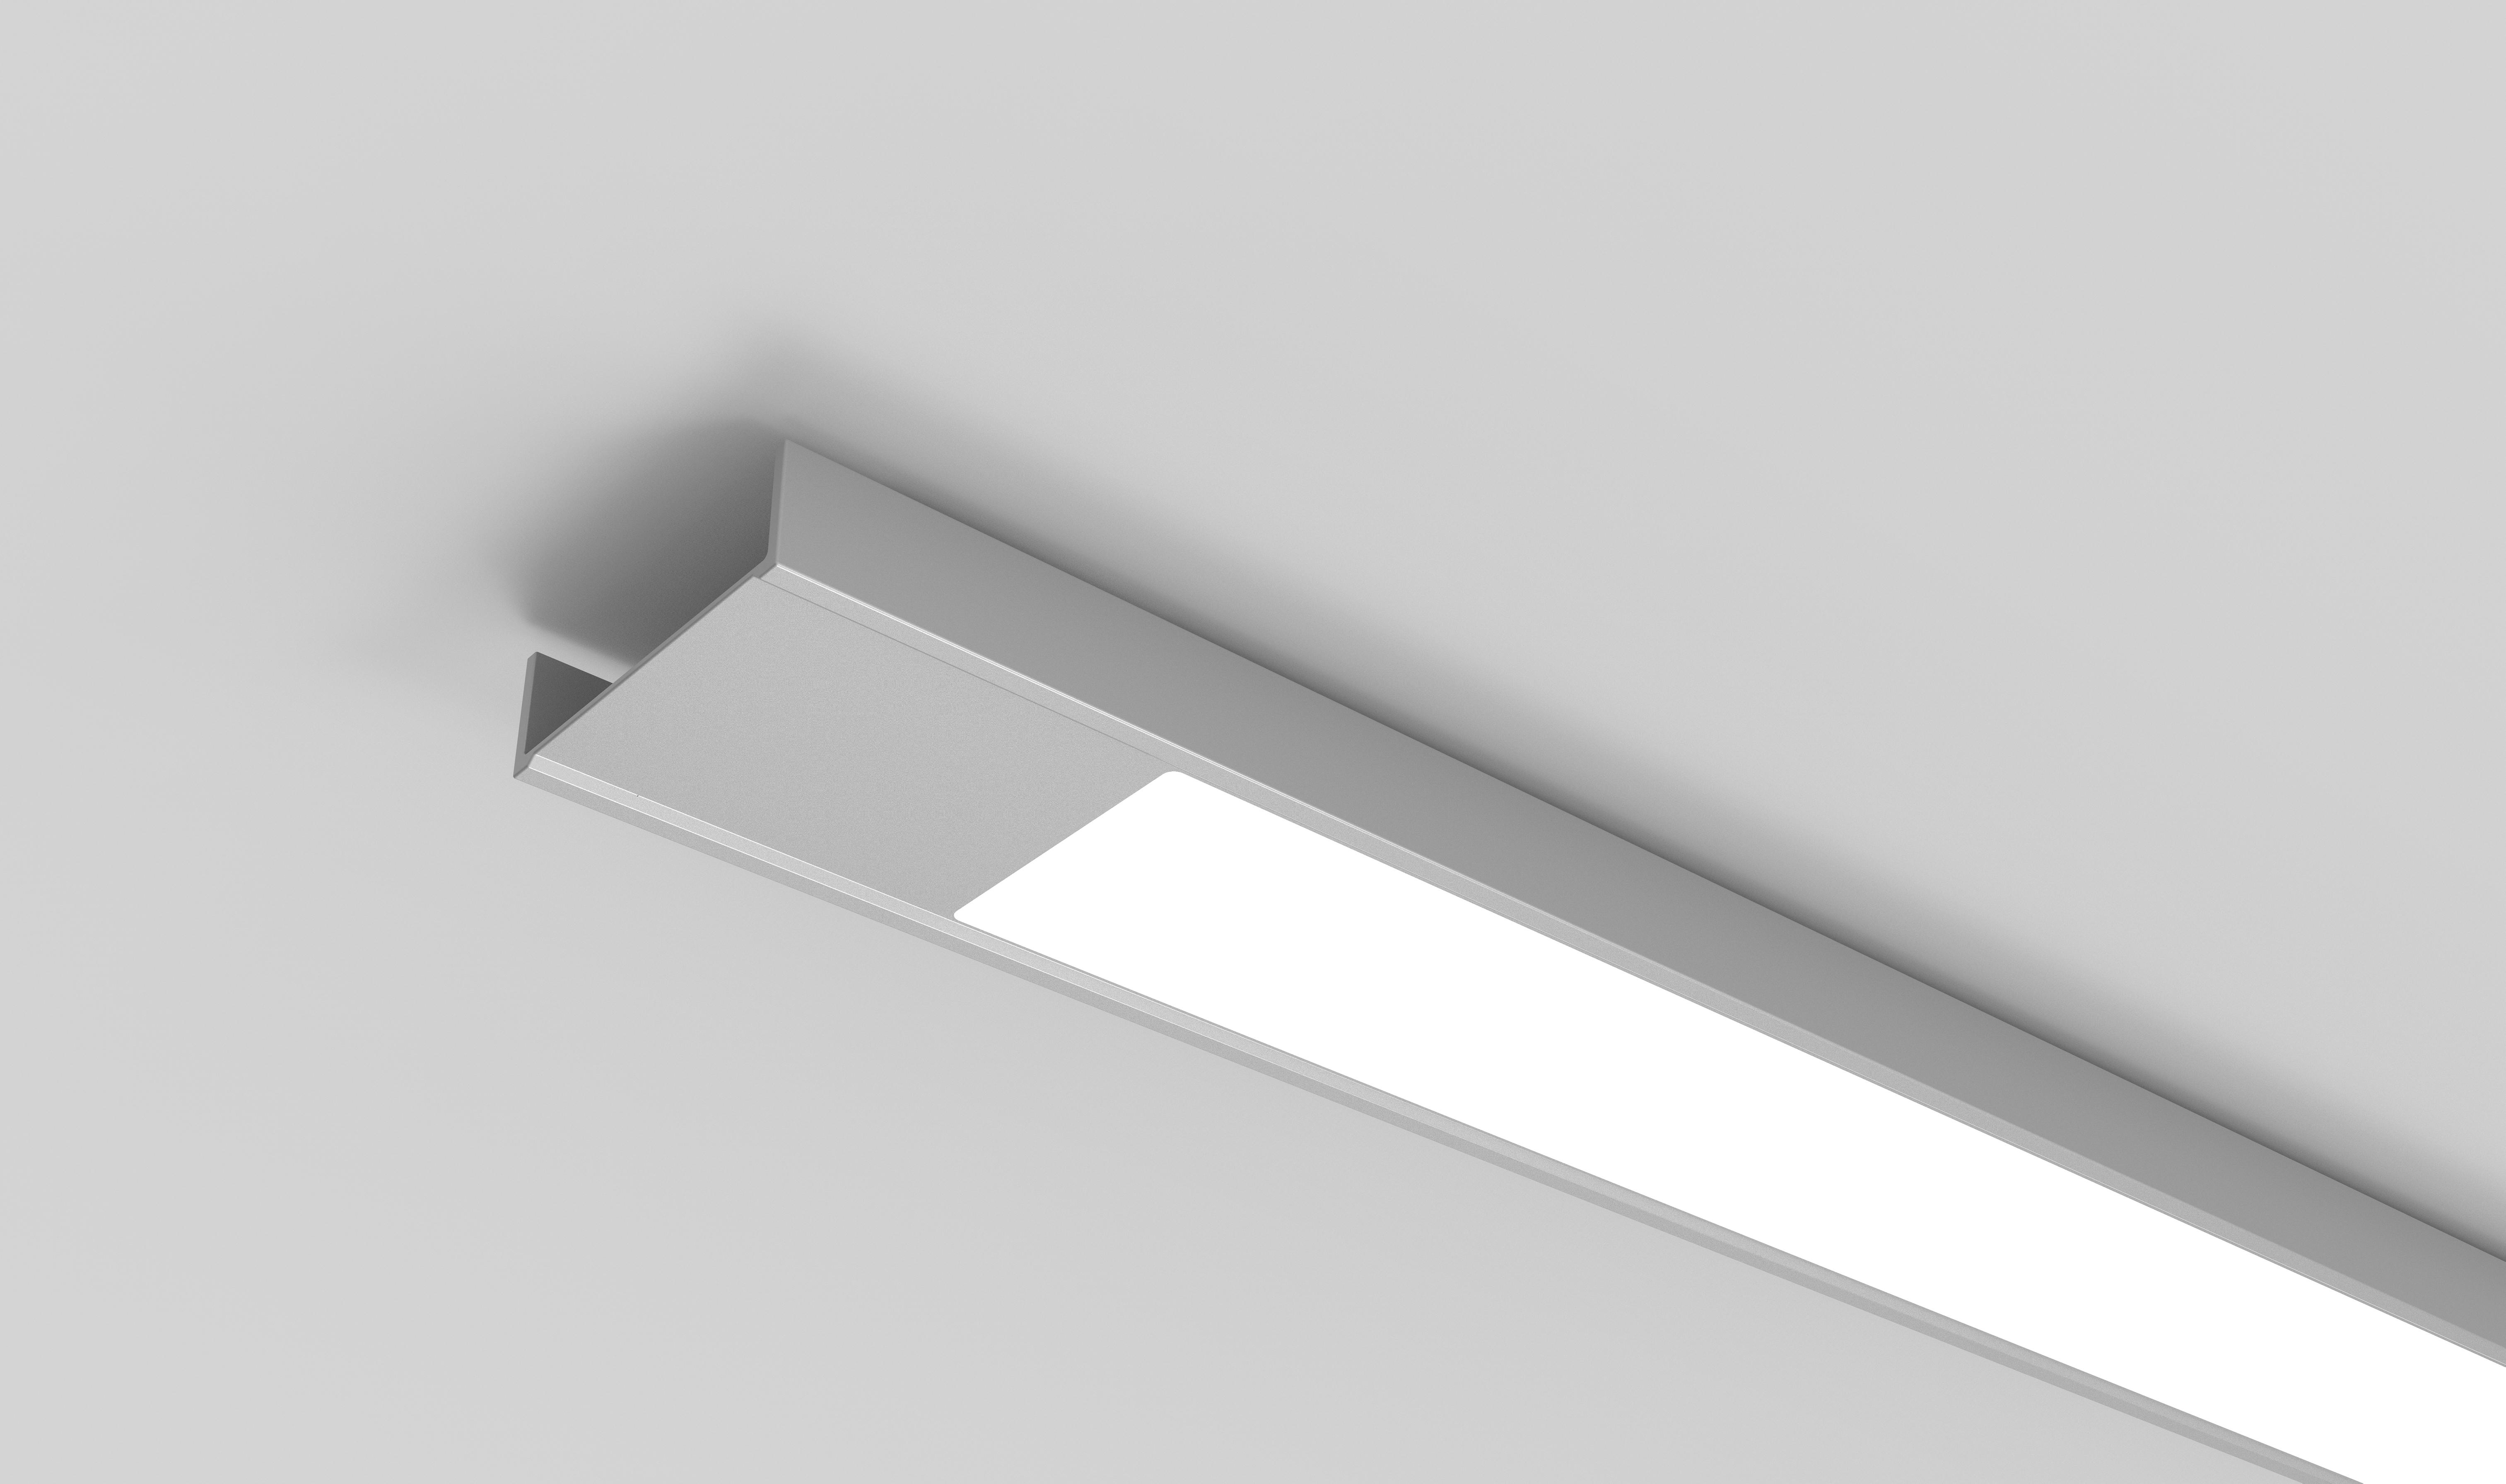 Direct Surface Mount_Sculpted Endcap_smaller size.jpg